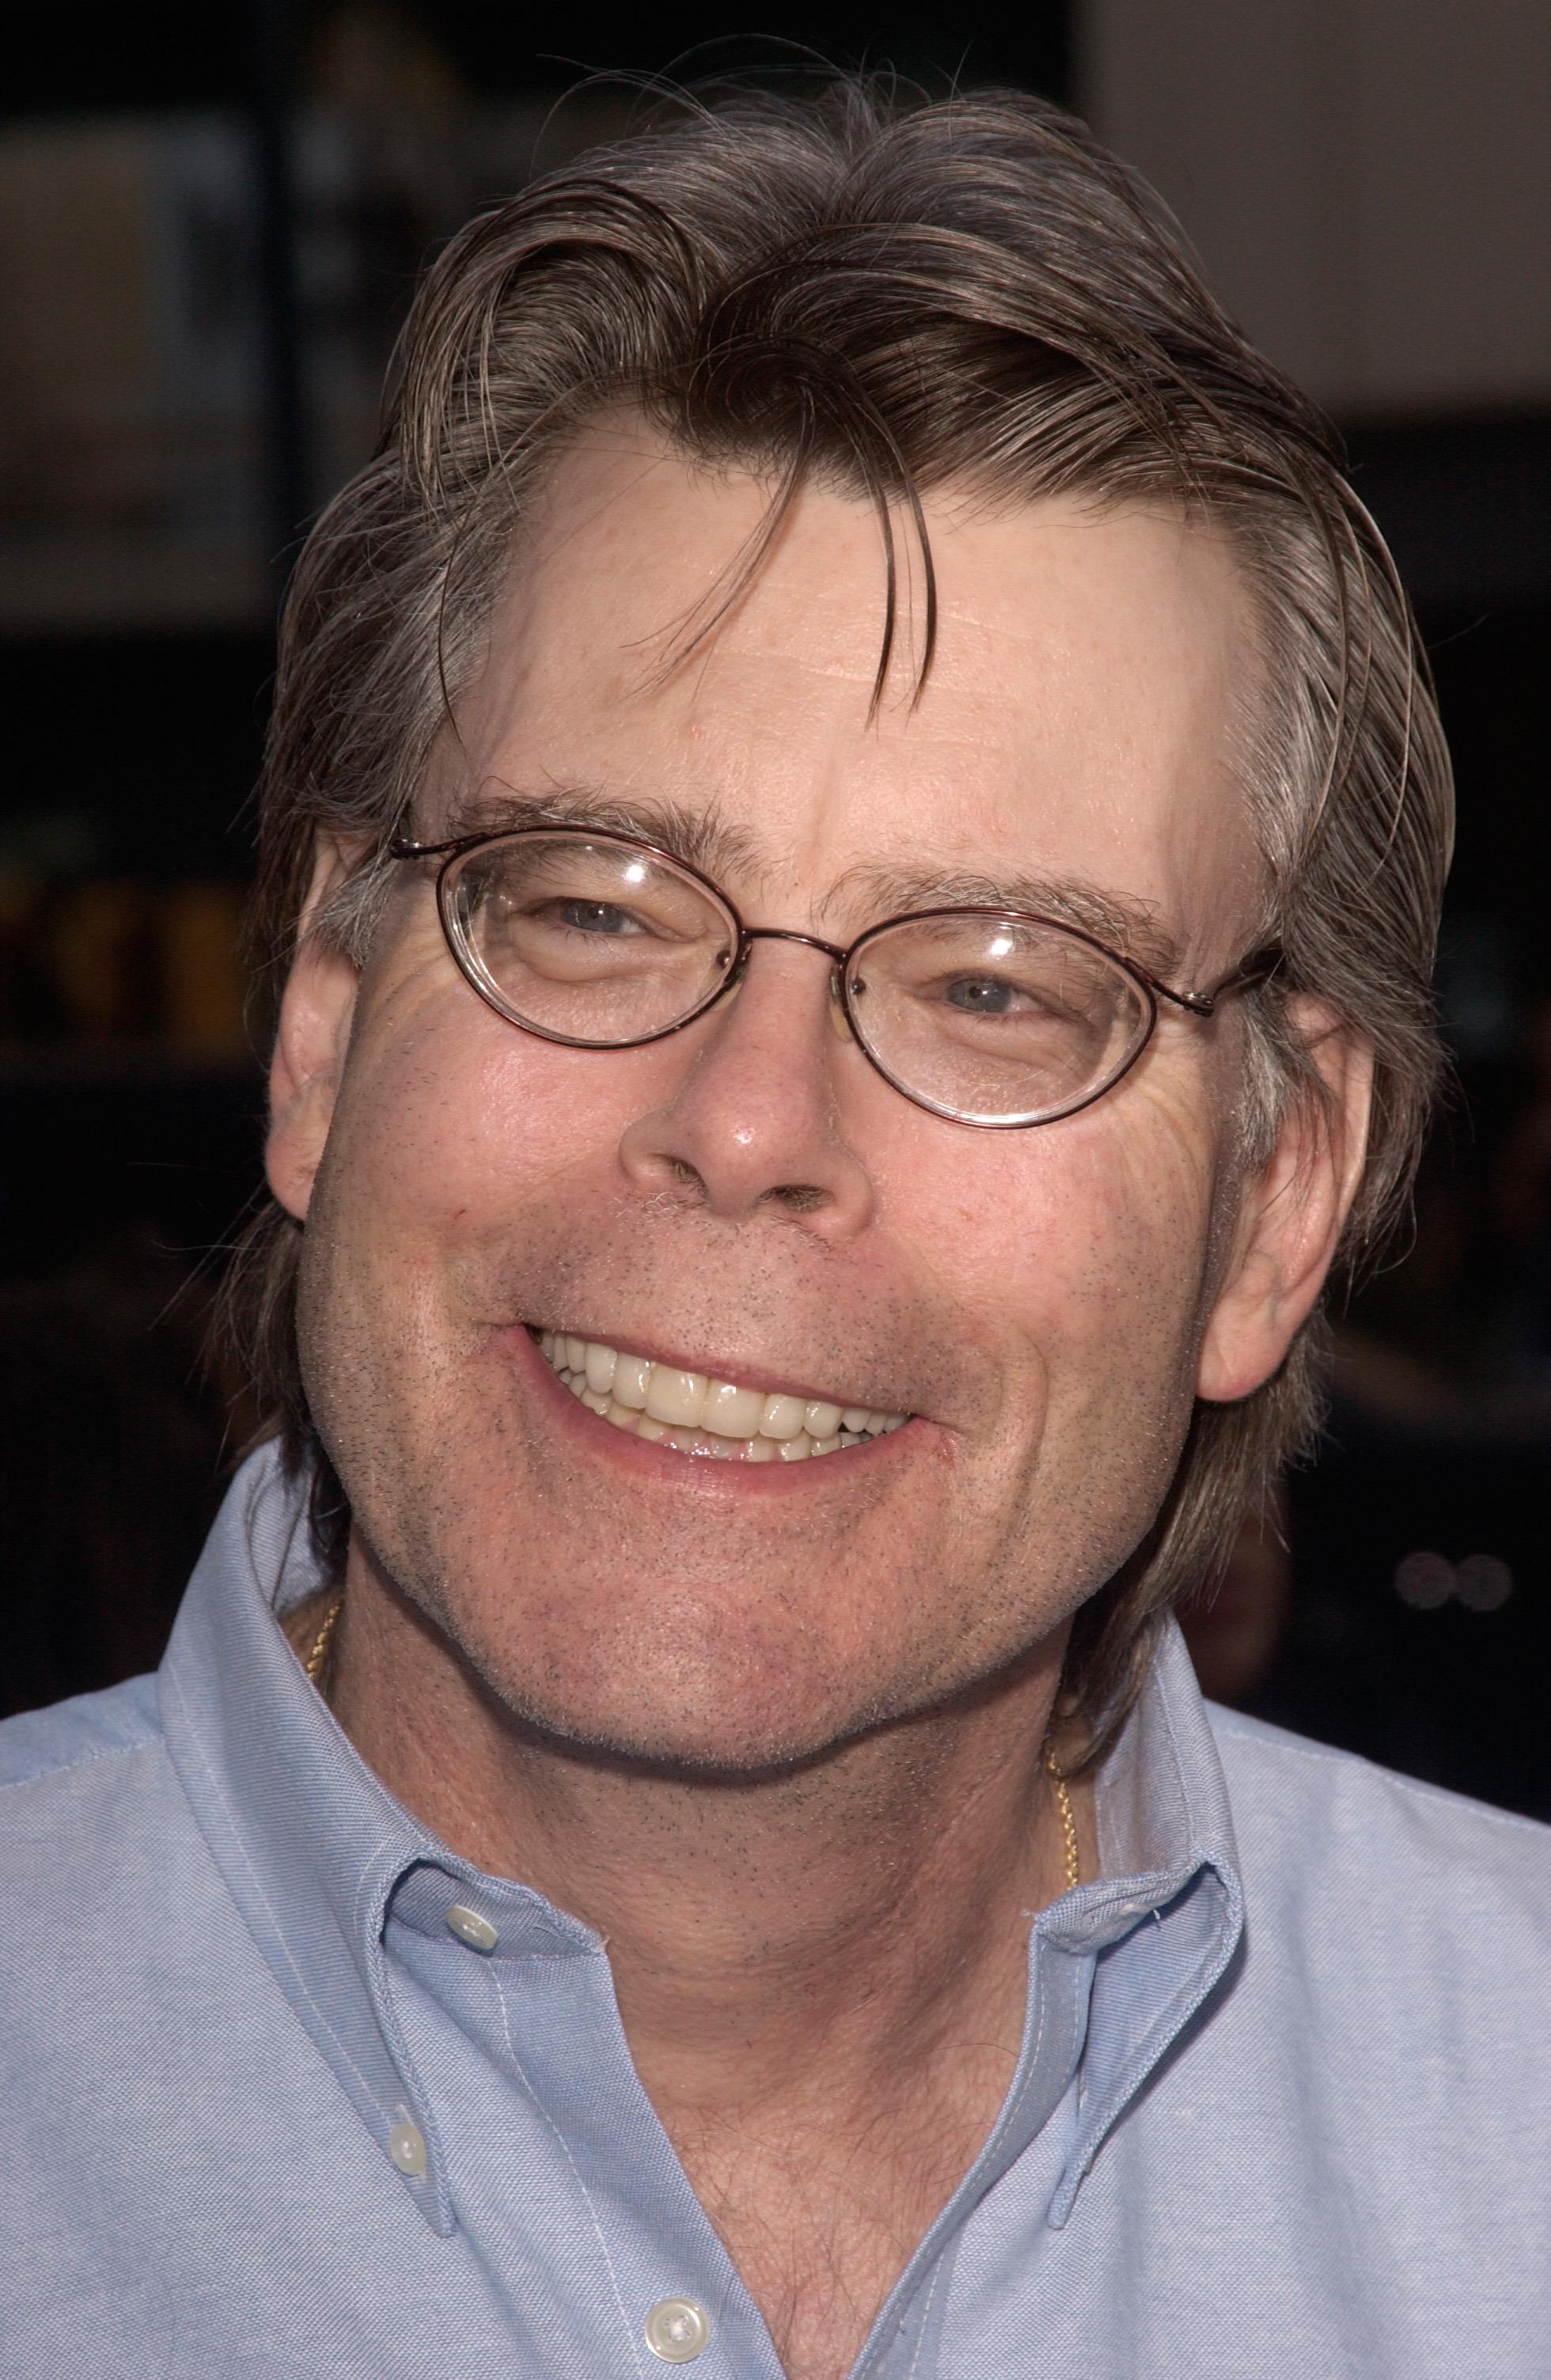 Stephen King - Biografia do escritor americano - InfoEscola